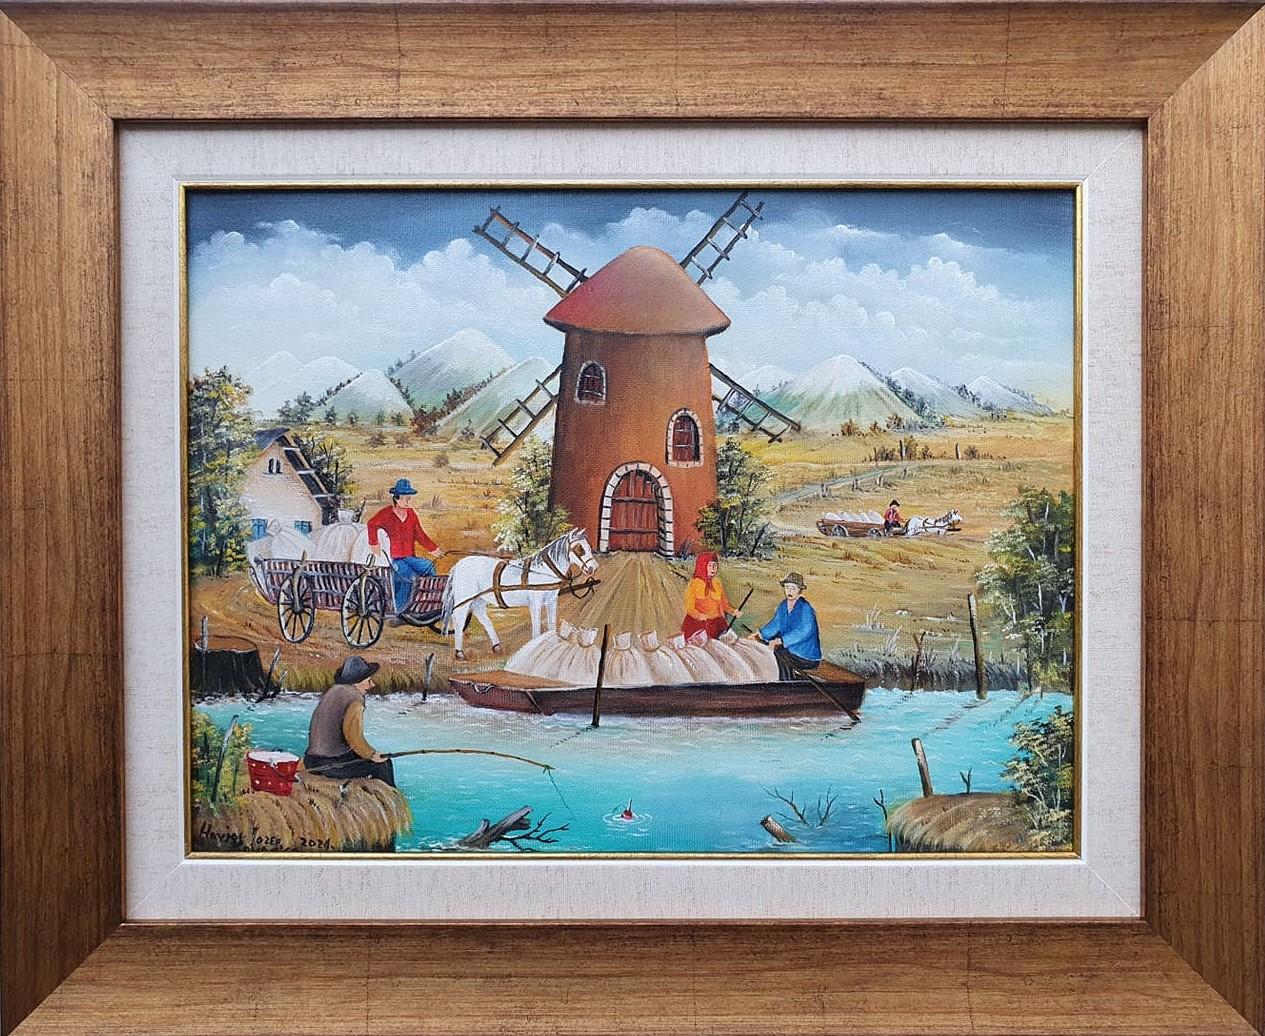 Vetrenjača, Jozef Havjar, Naiva Kovačica, ulje na platnu, uramljena, sa 46×56 cm, bez 30×40 cm, sertifikat, 350 eura